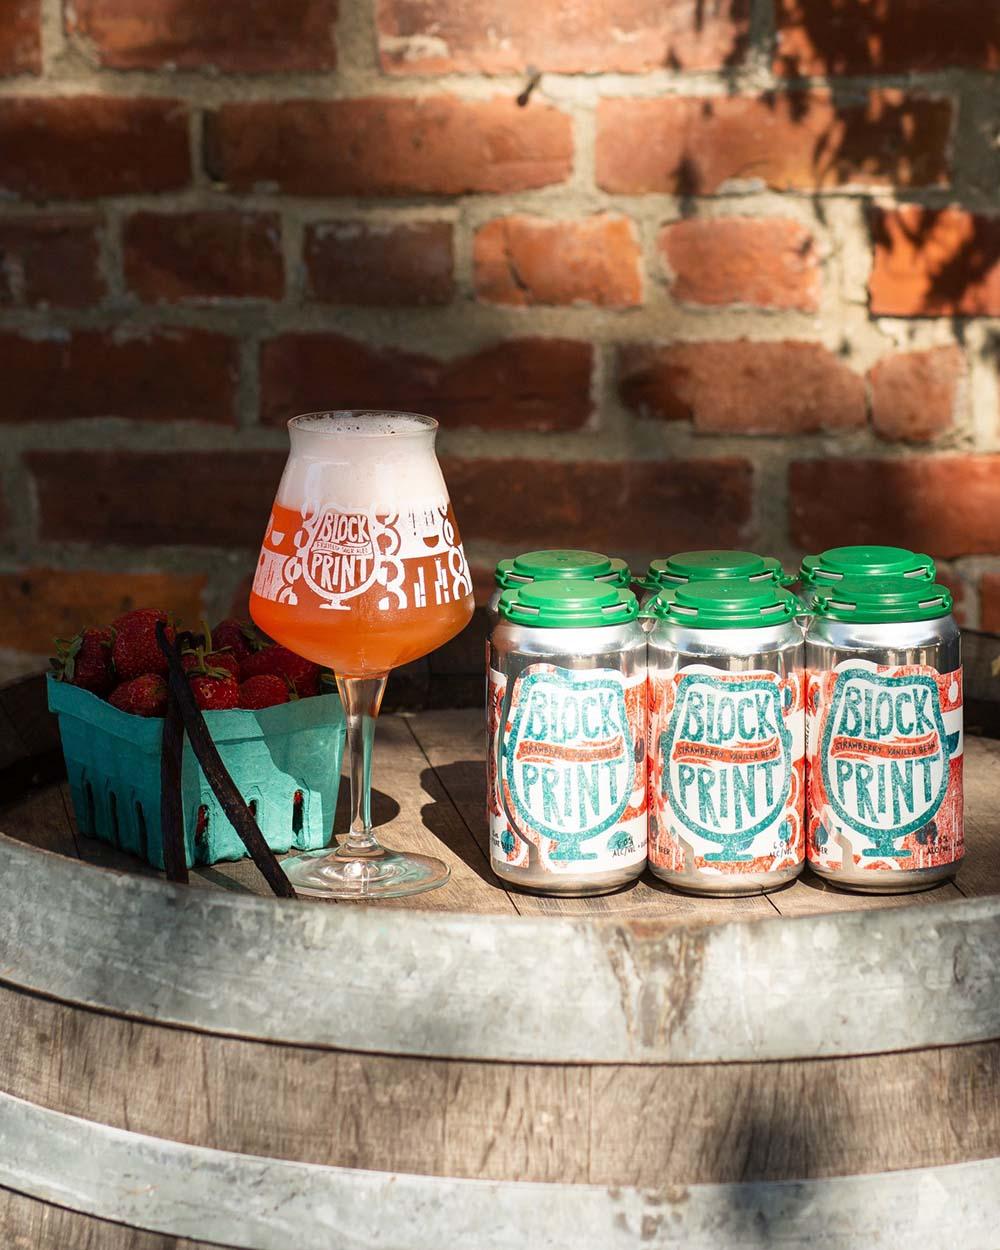 Foam Brewers, Blockprint: Strawberry + Vanilla Bean